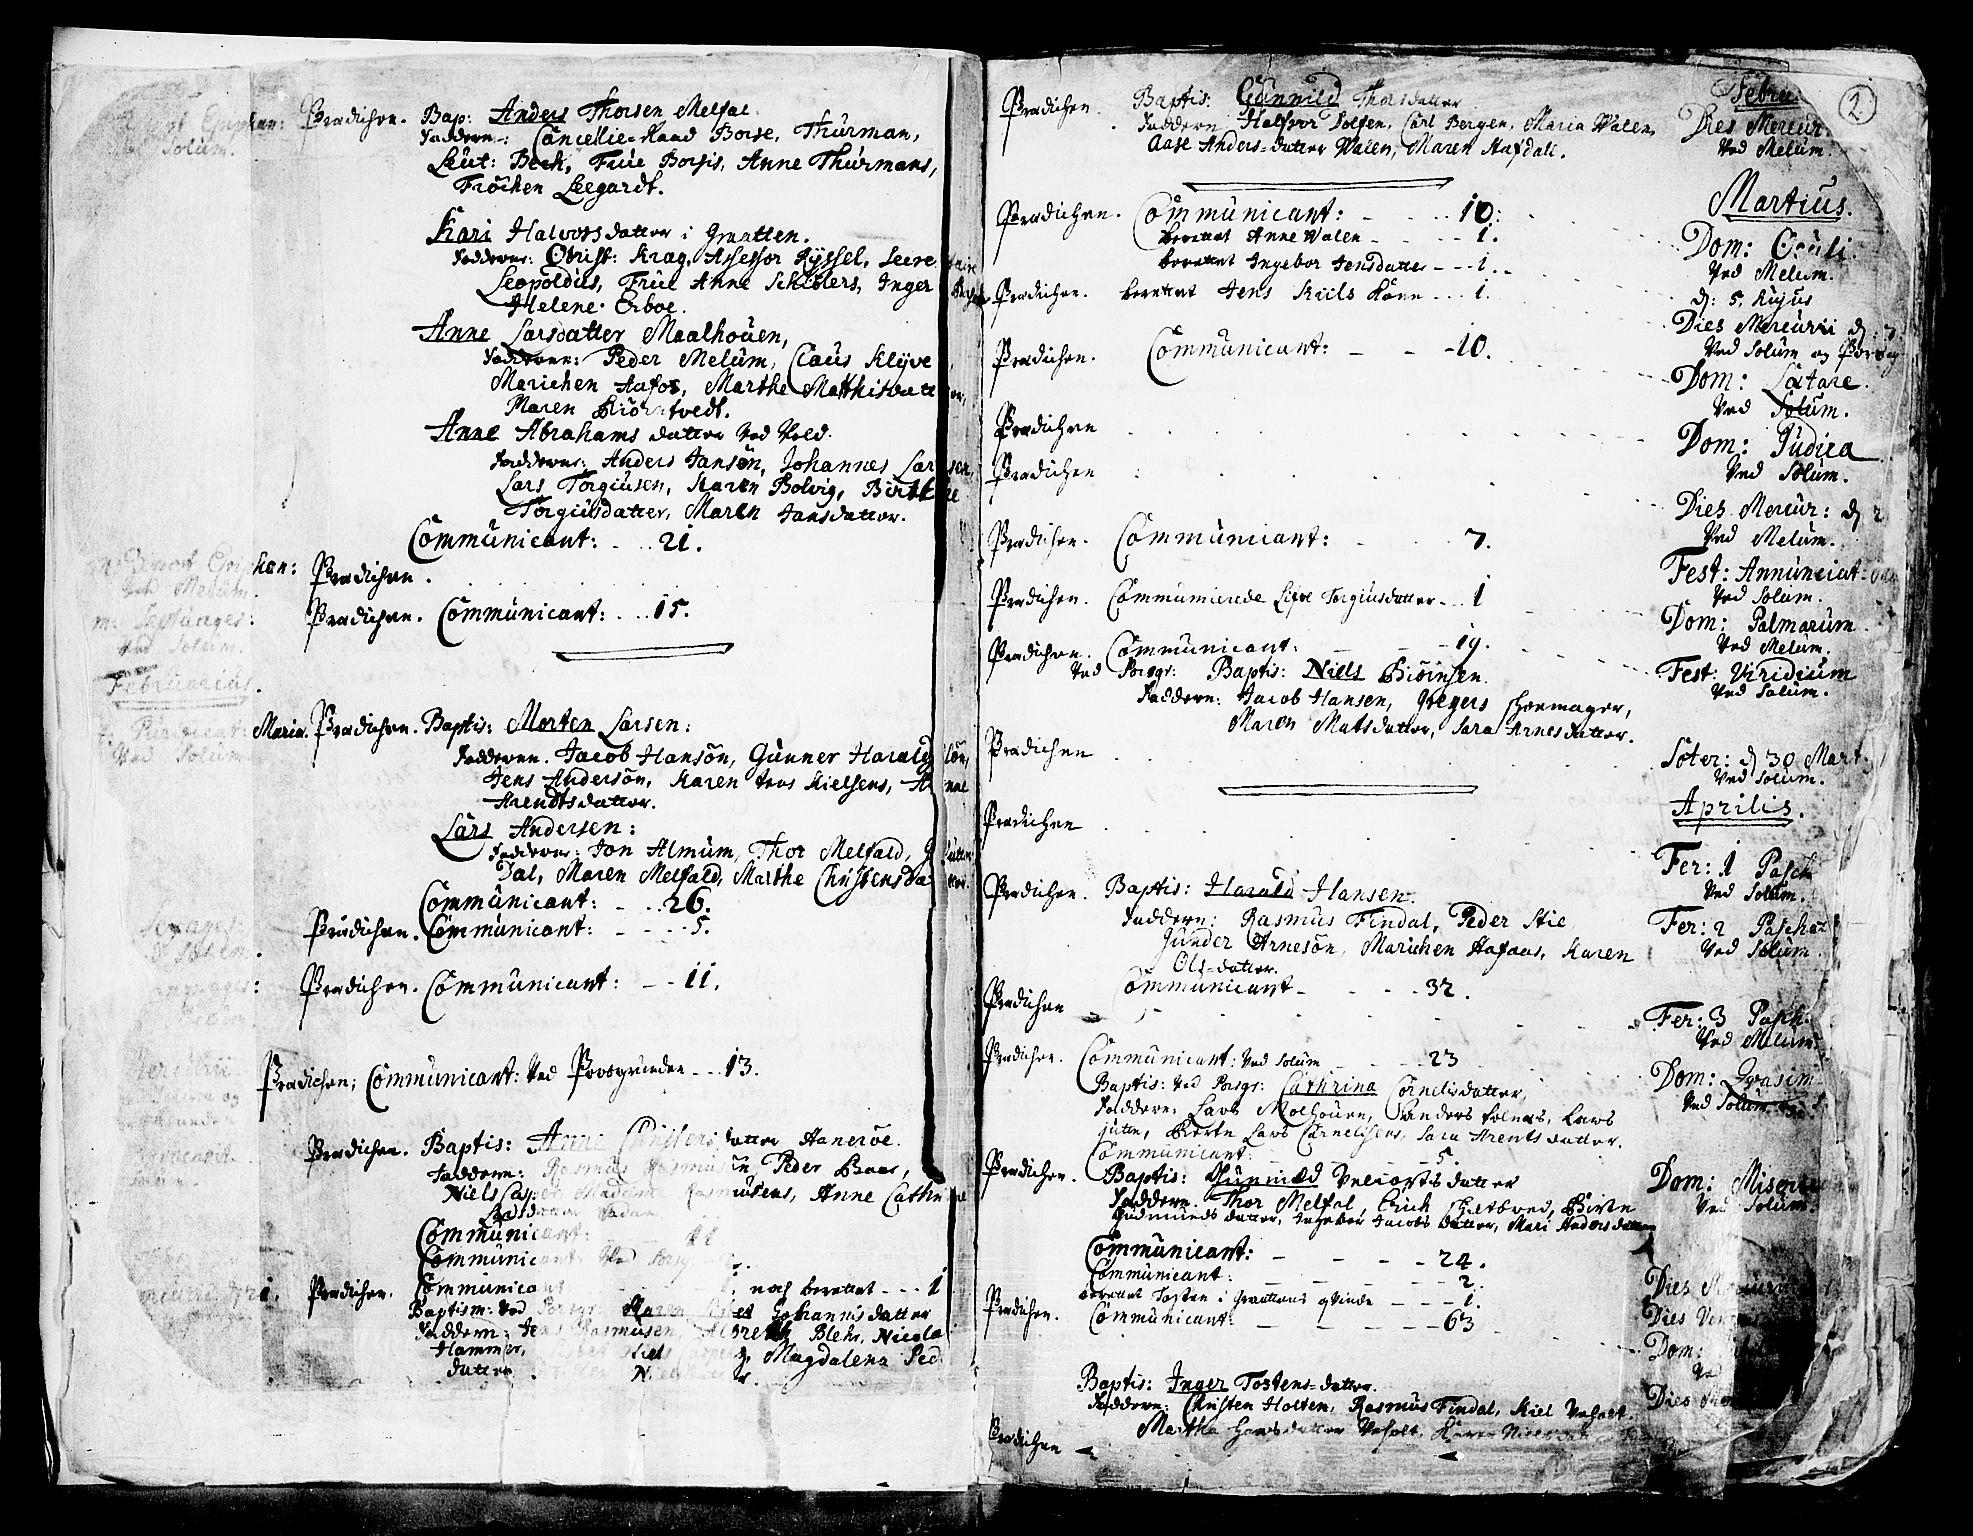 SAKO, Solum kirkebøker, F/Fa/L0002: Ministerialbok nr. I 2, 1713-1761, s. 2